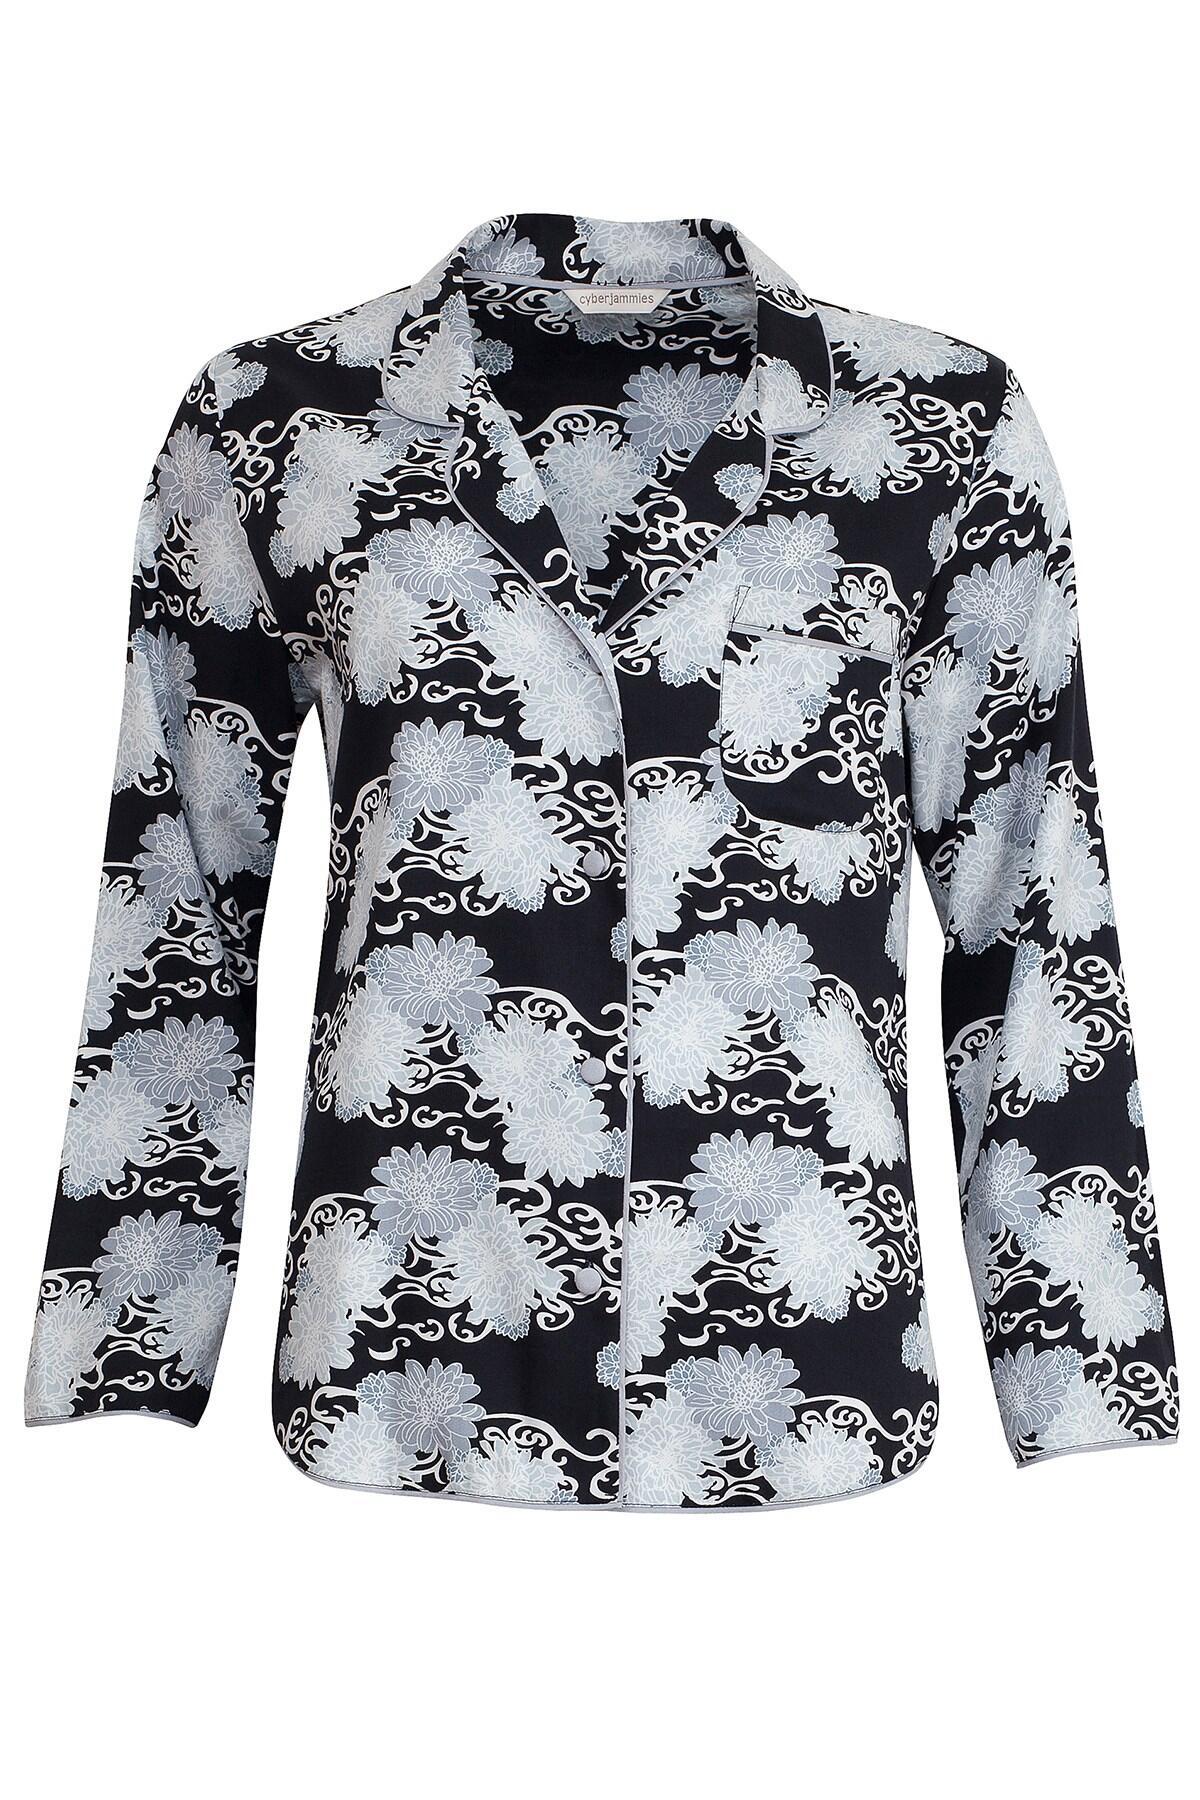 Monochrome Elegance Top - Black